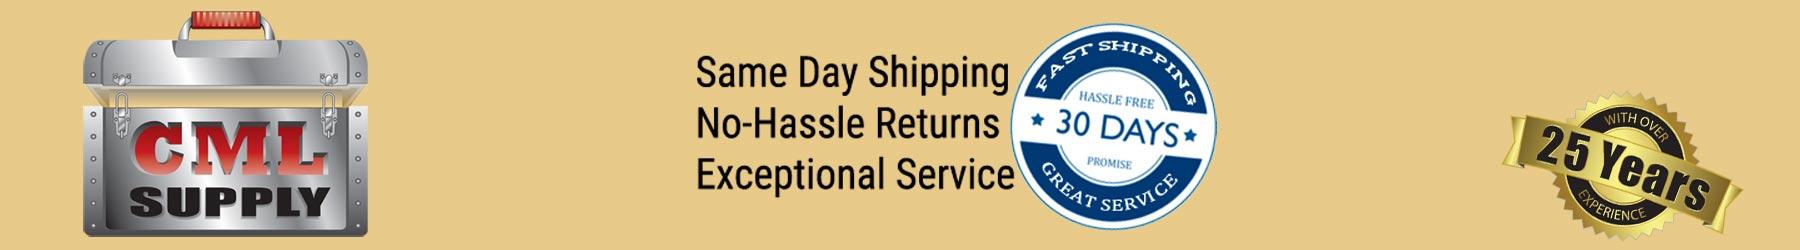 CML Supply - eBay Store